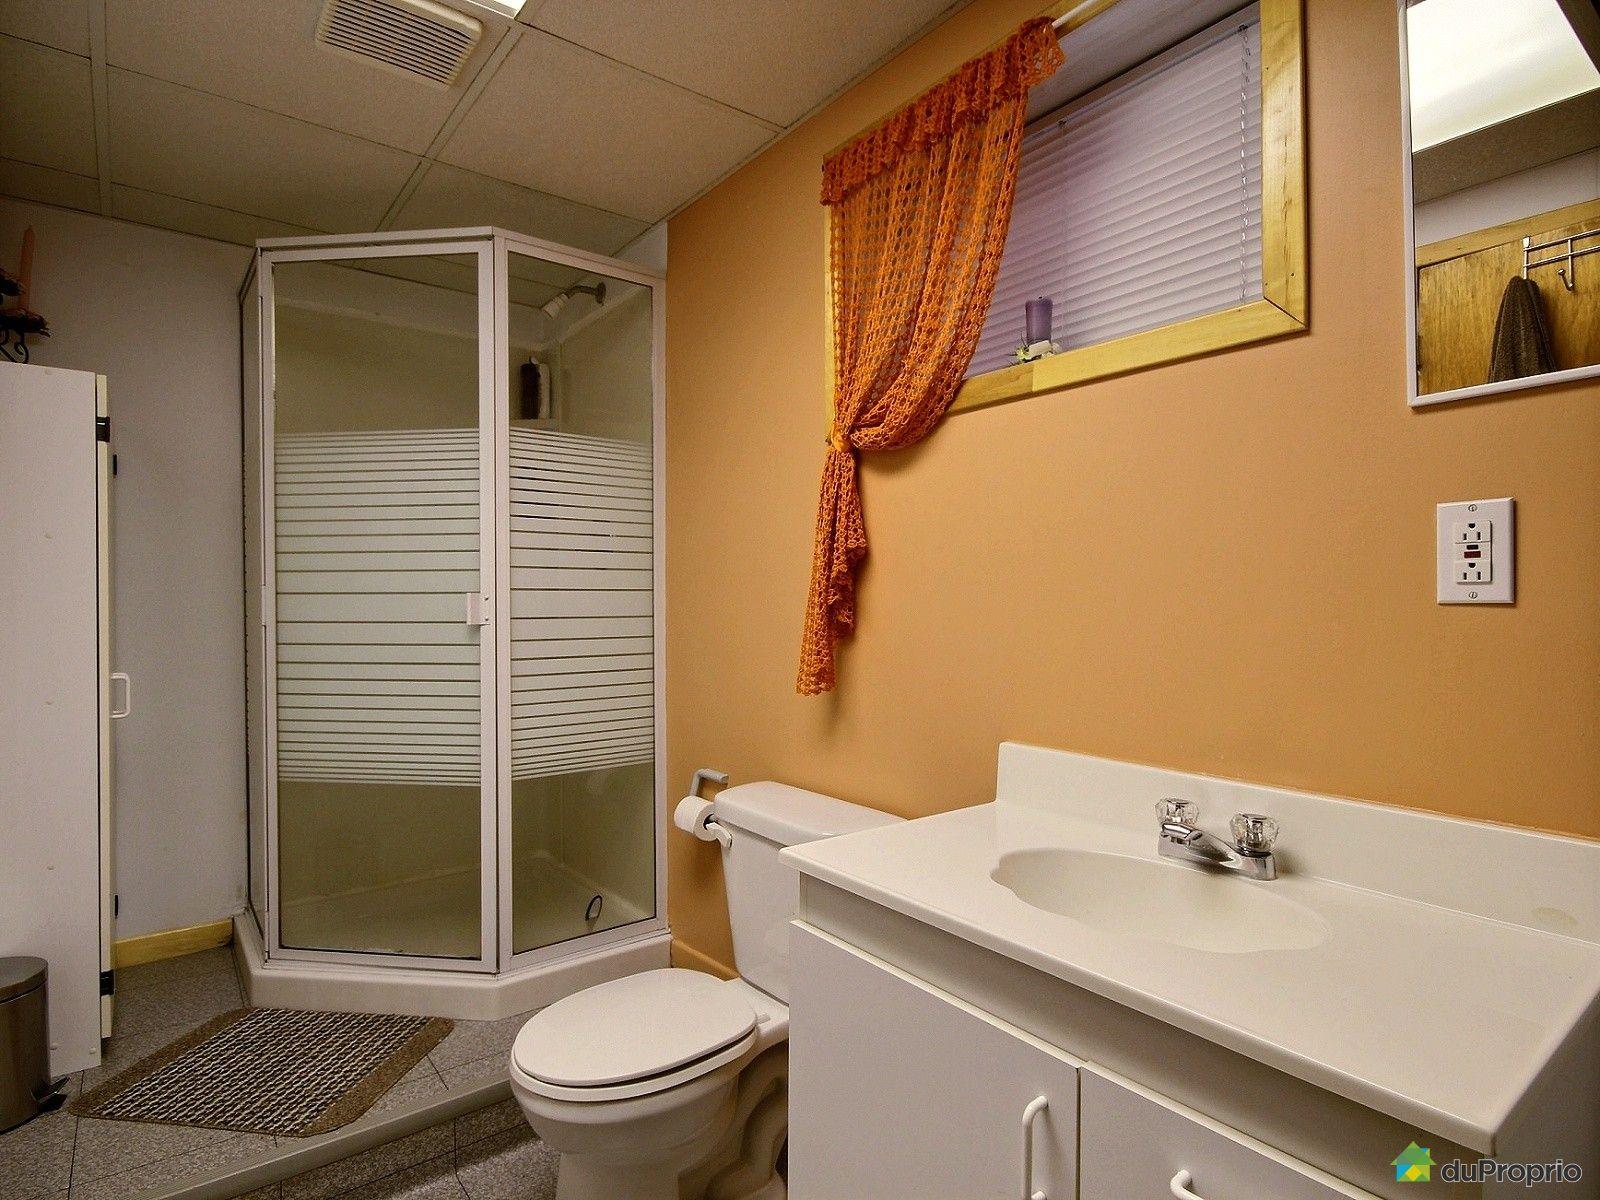 Maison vendre dolbeau mistassini 314 rue villeneuve for Salle de bain mobile